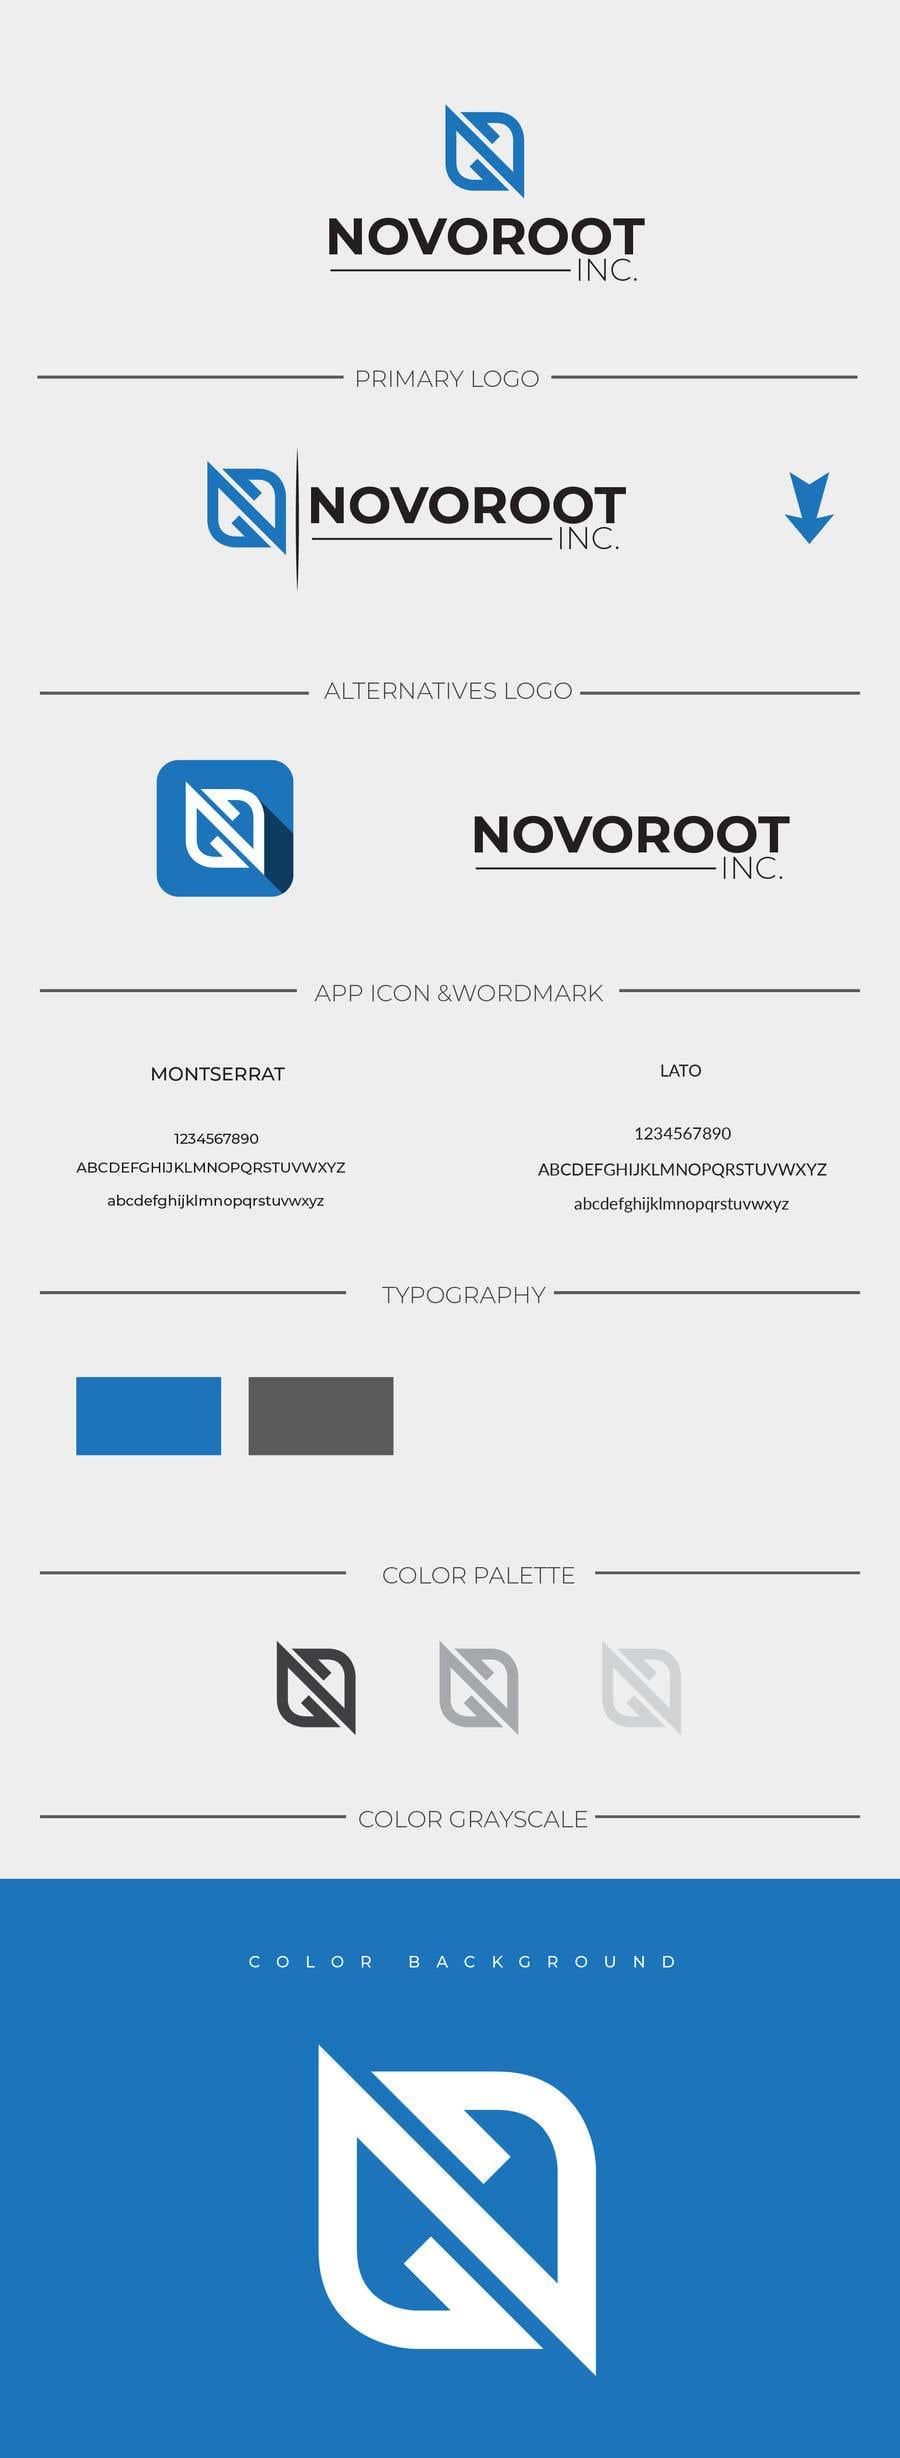 Konkurrenceindlæg #47 for Design a logo and social media layouts